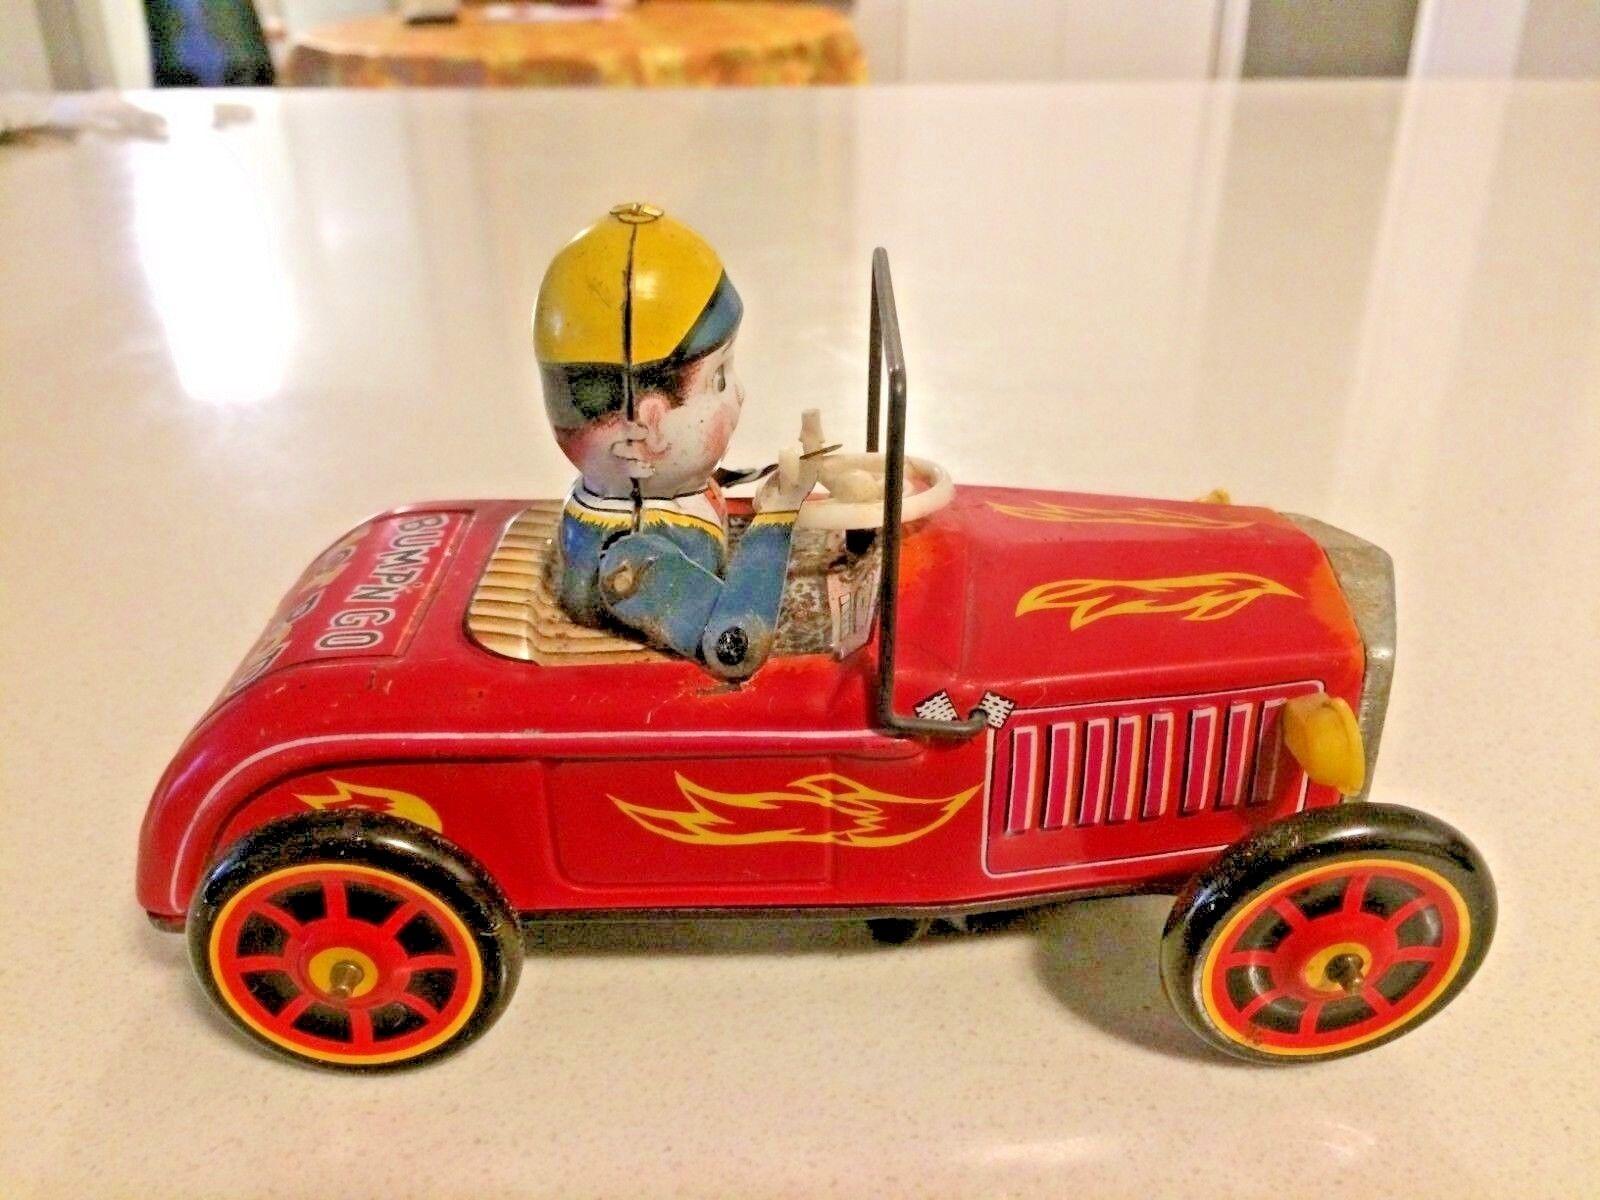 Jahr ANTIQUE KO BUMP'N GO heiß ROD Tin Spielzeug. Made In Japan. Rare